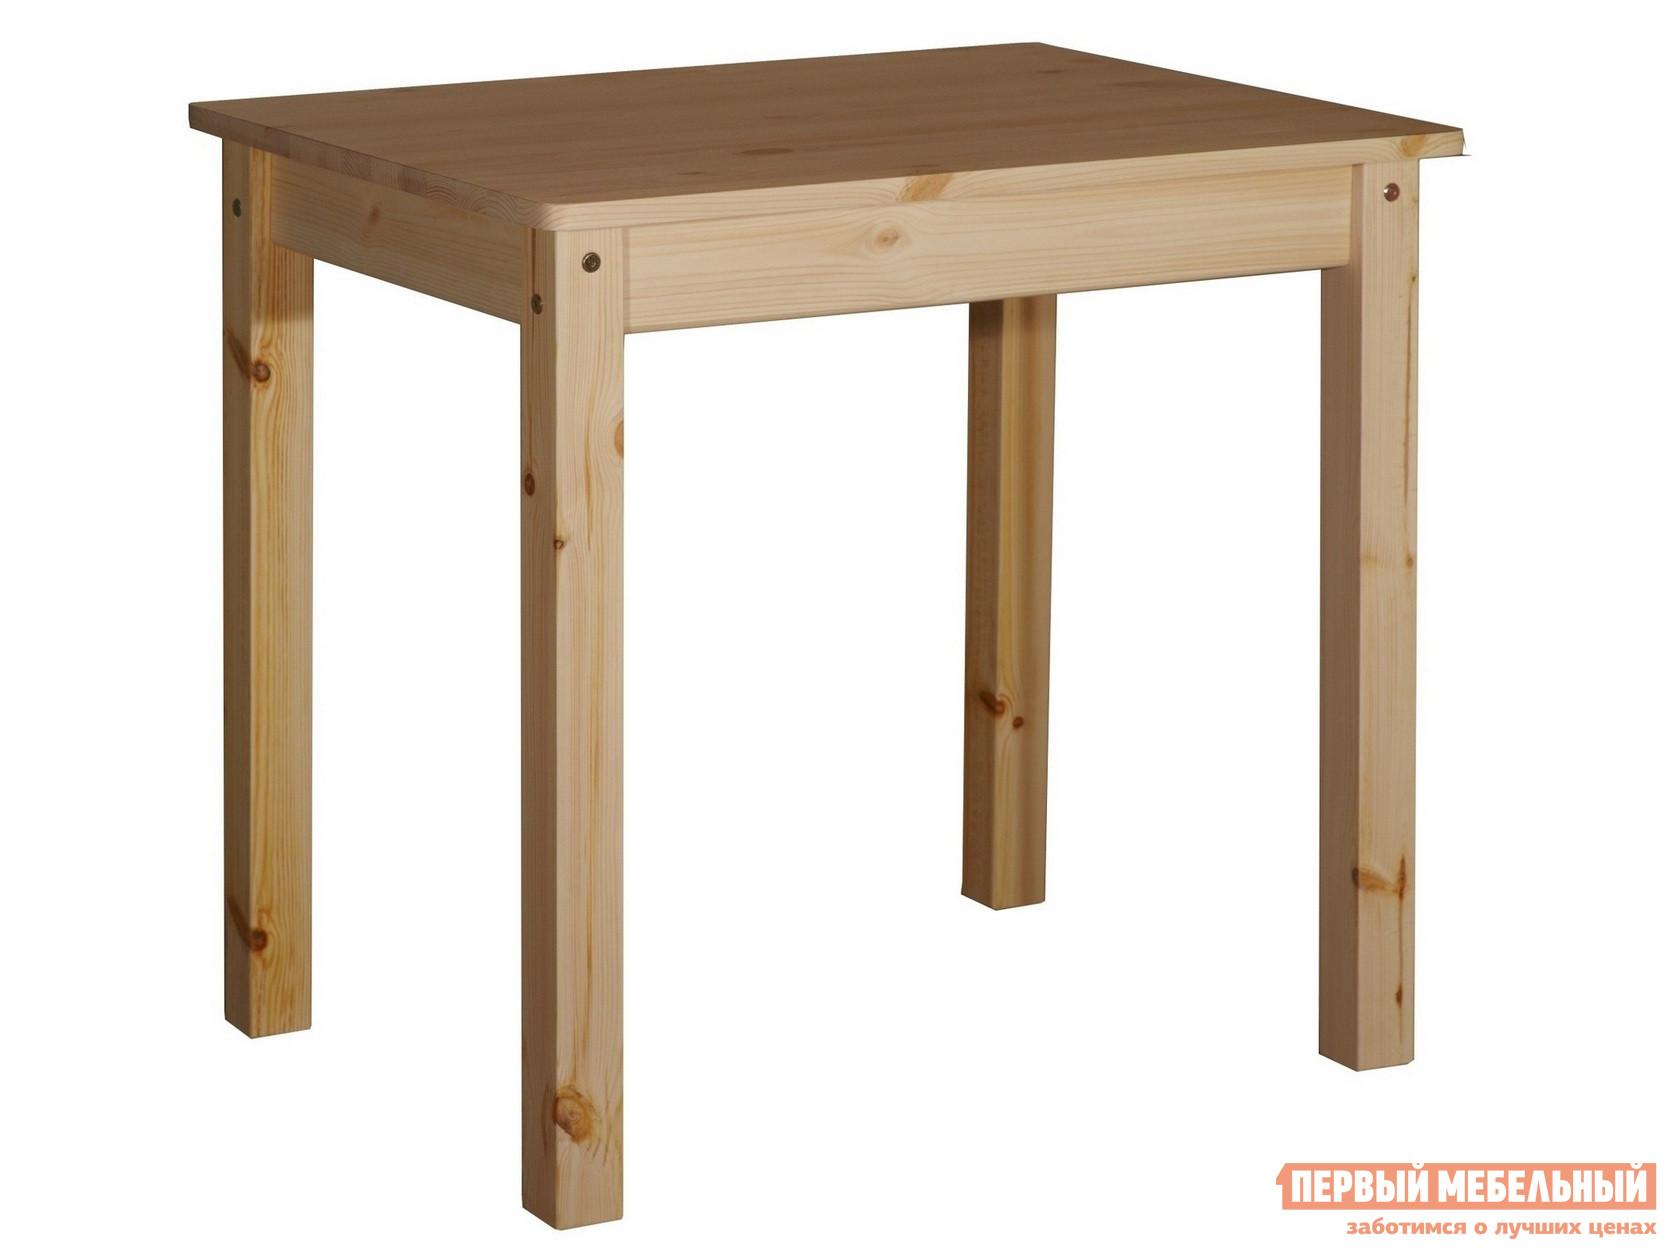 Стол для дачи из дерева Timberica Стол обеденный Классик